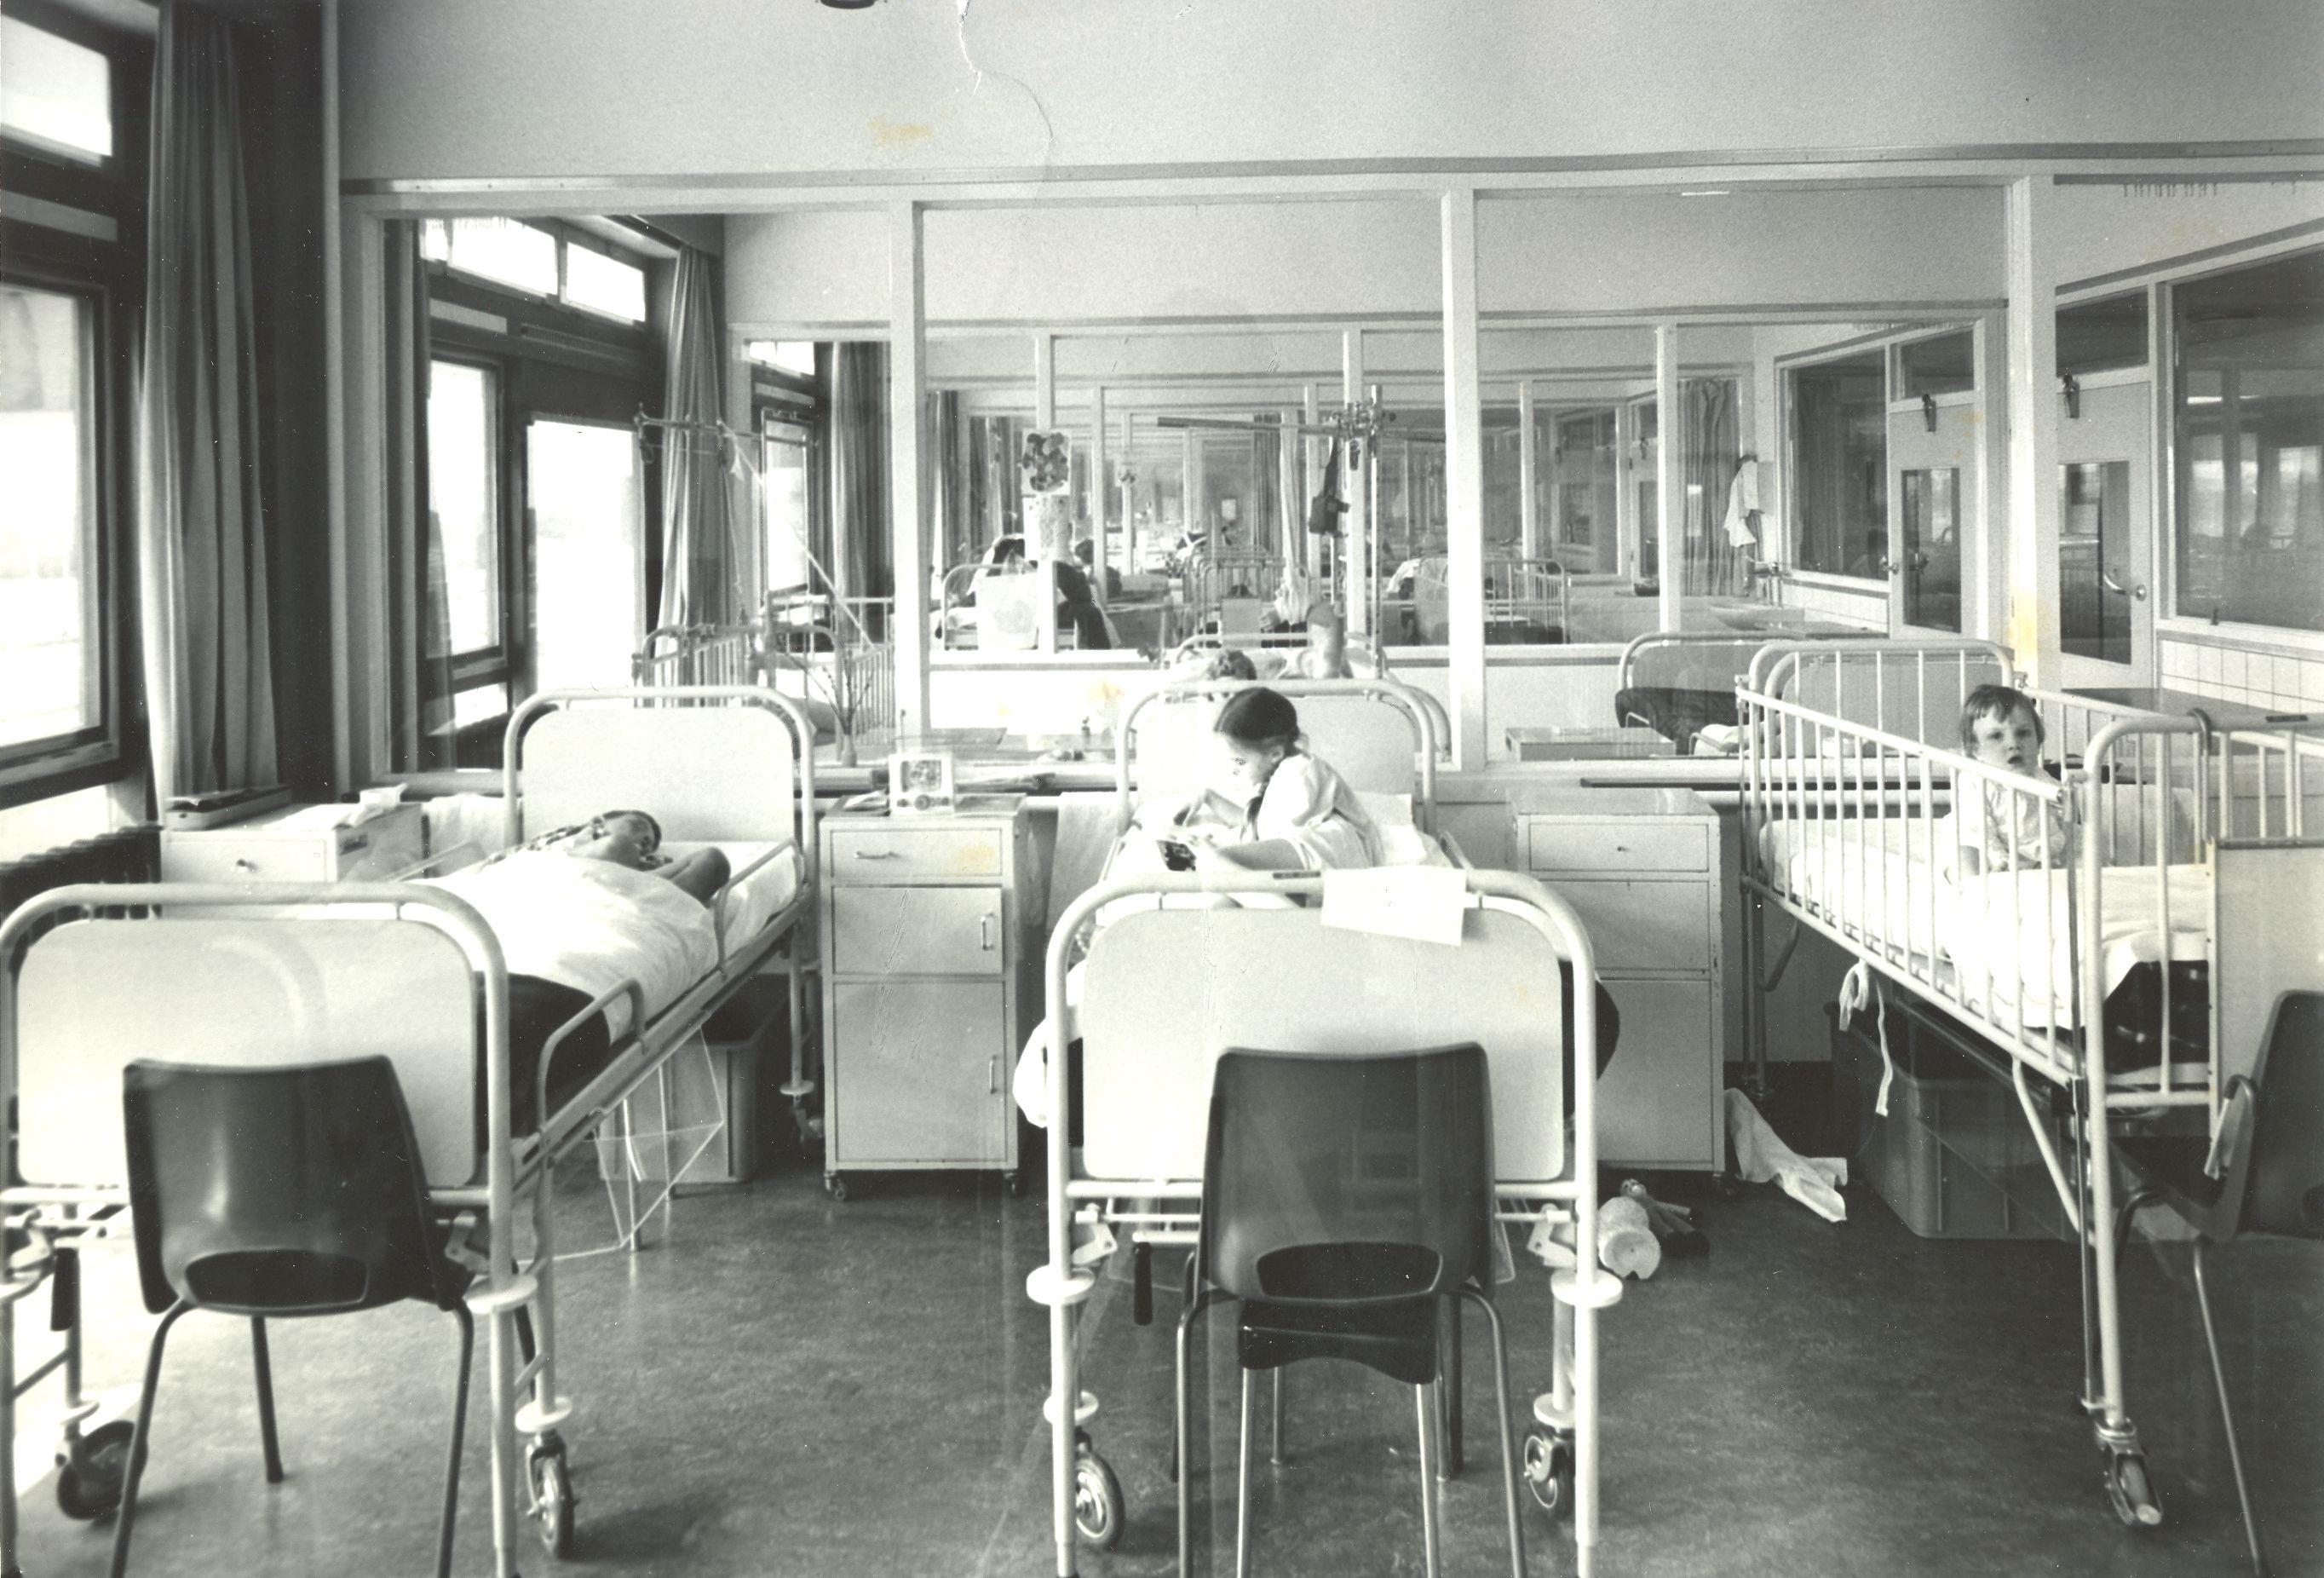 Diaconessenhuis Eindhoven Kinderafdeling Ziekenhuis Healthcare Hospital 1967 Nostalgia Eindhoven Nurse